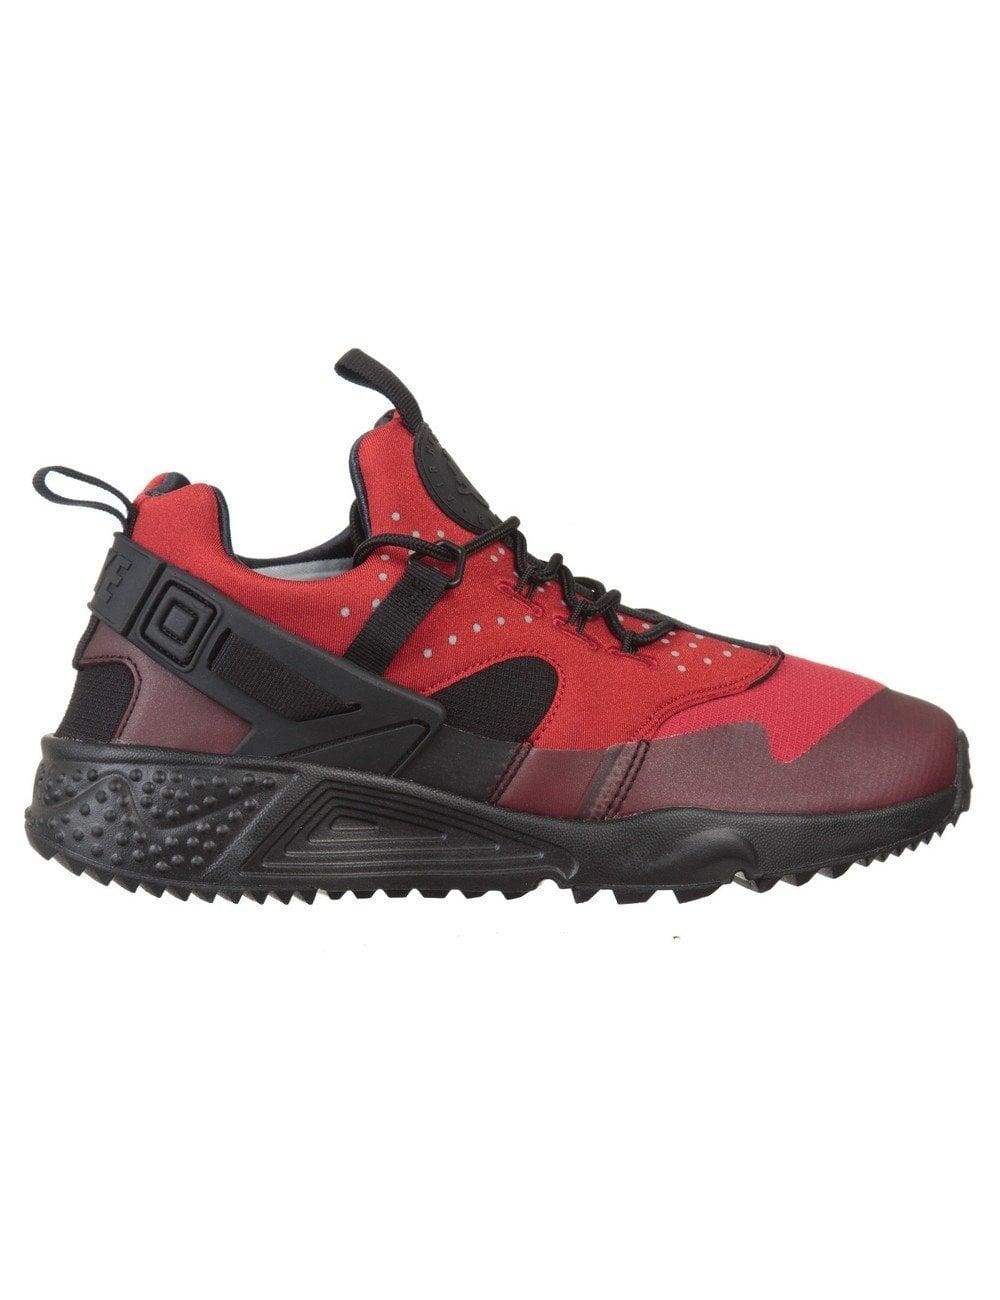 sale retailer c0fb0 c5b9c Air Huarache Utility Shoes - Gym Red Black